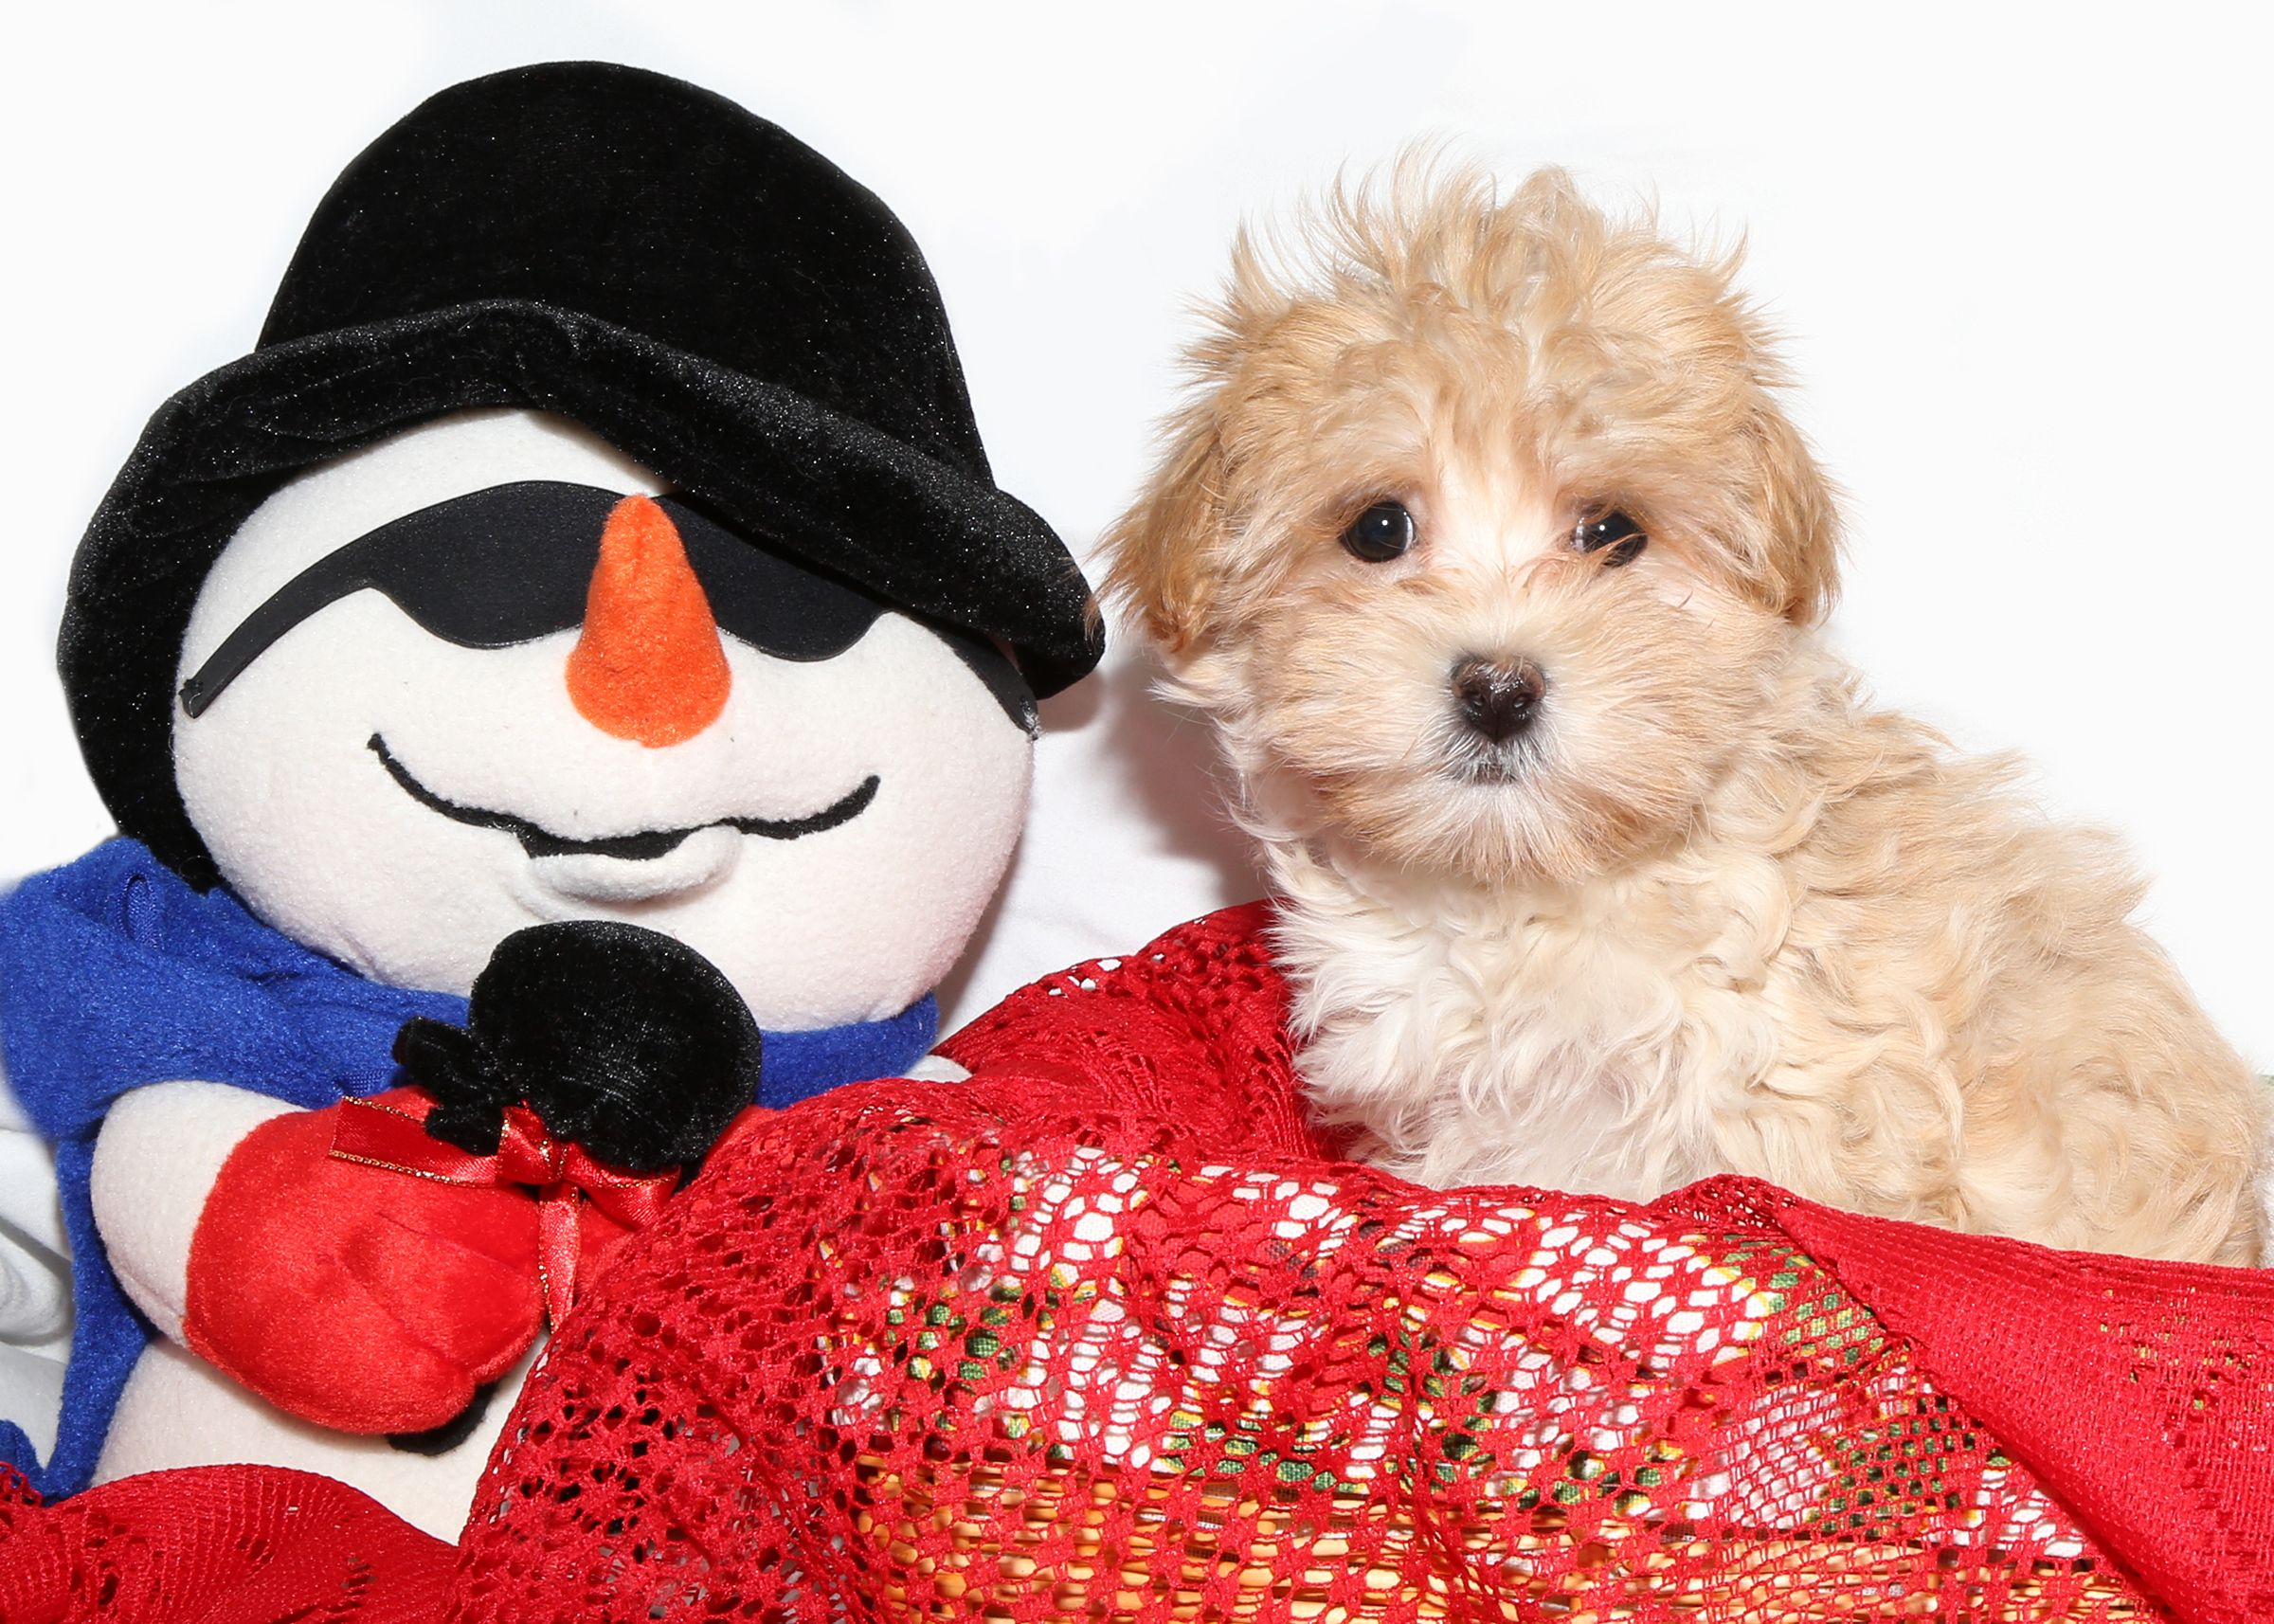 Maltipoo for sale at puppy love in franklin square puppy